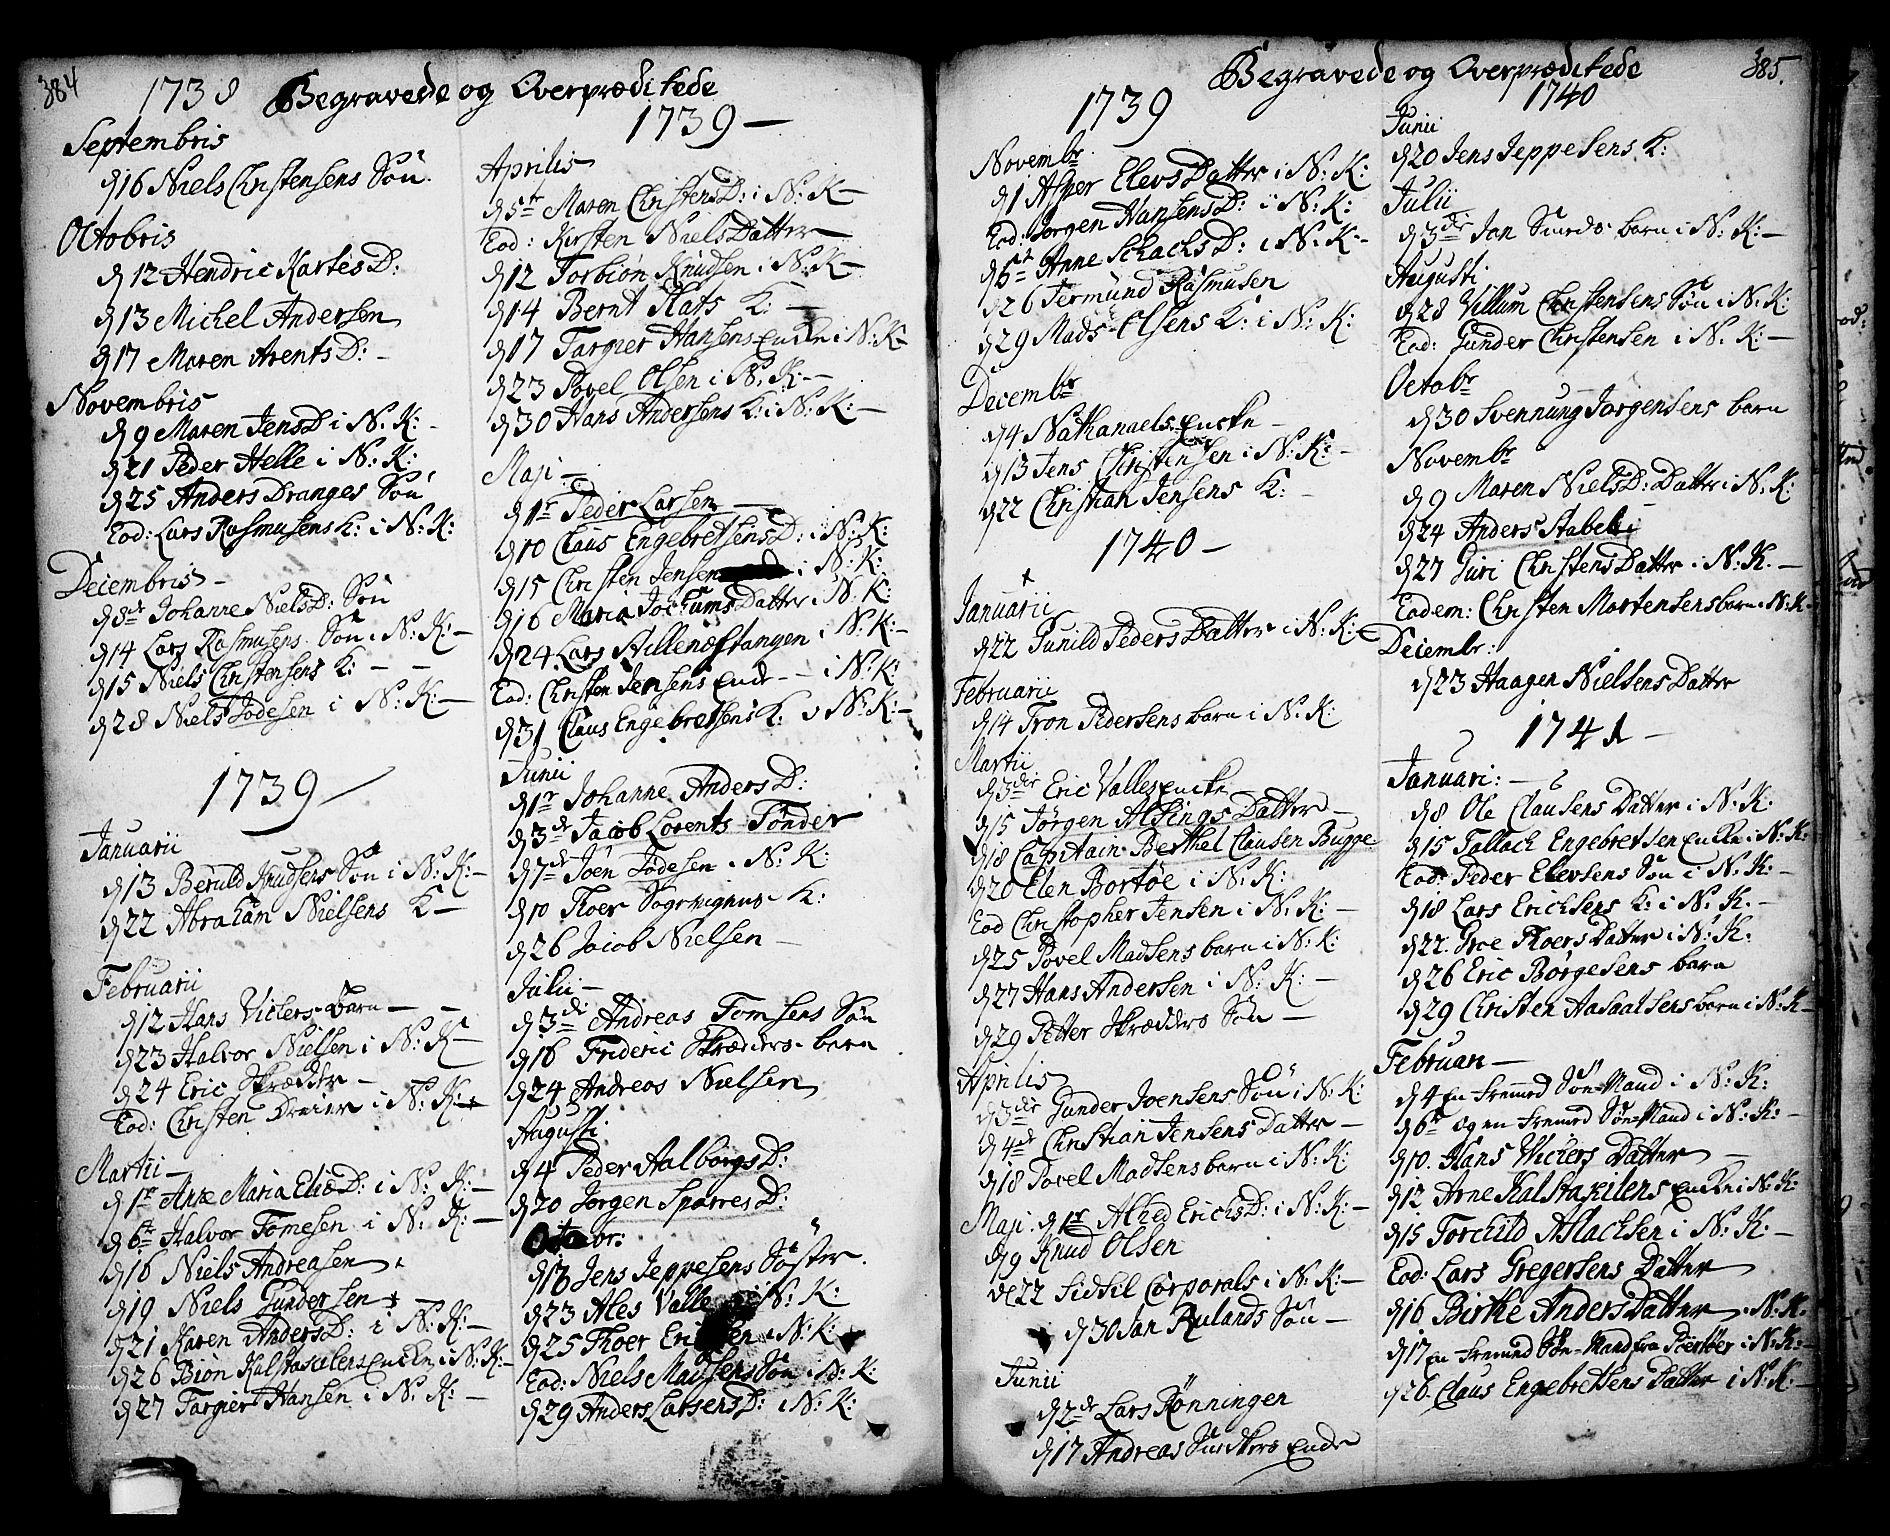 SAKO, Kragerø kirkebøker, F/Fa/L0001: Ministerialbok nr. 1, 1702-1766, s. 384-385